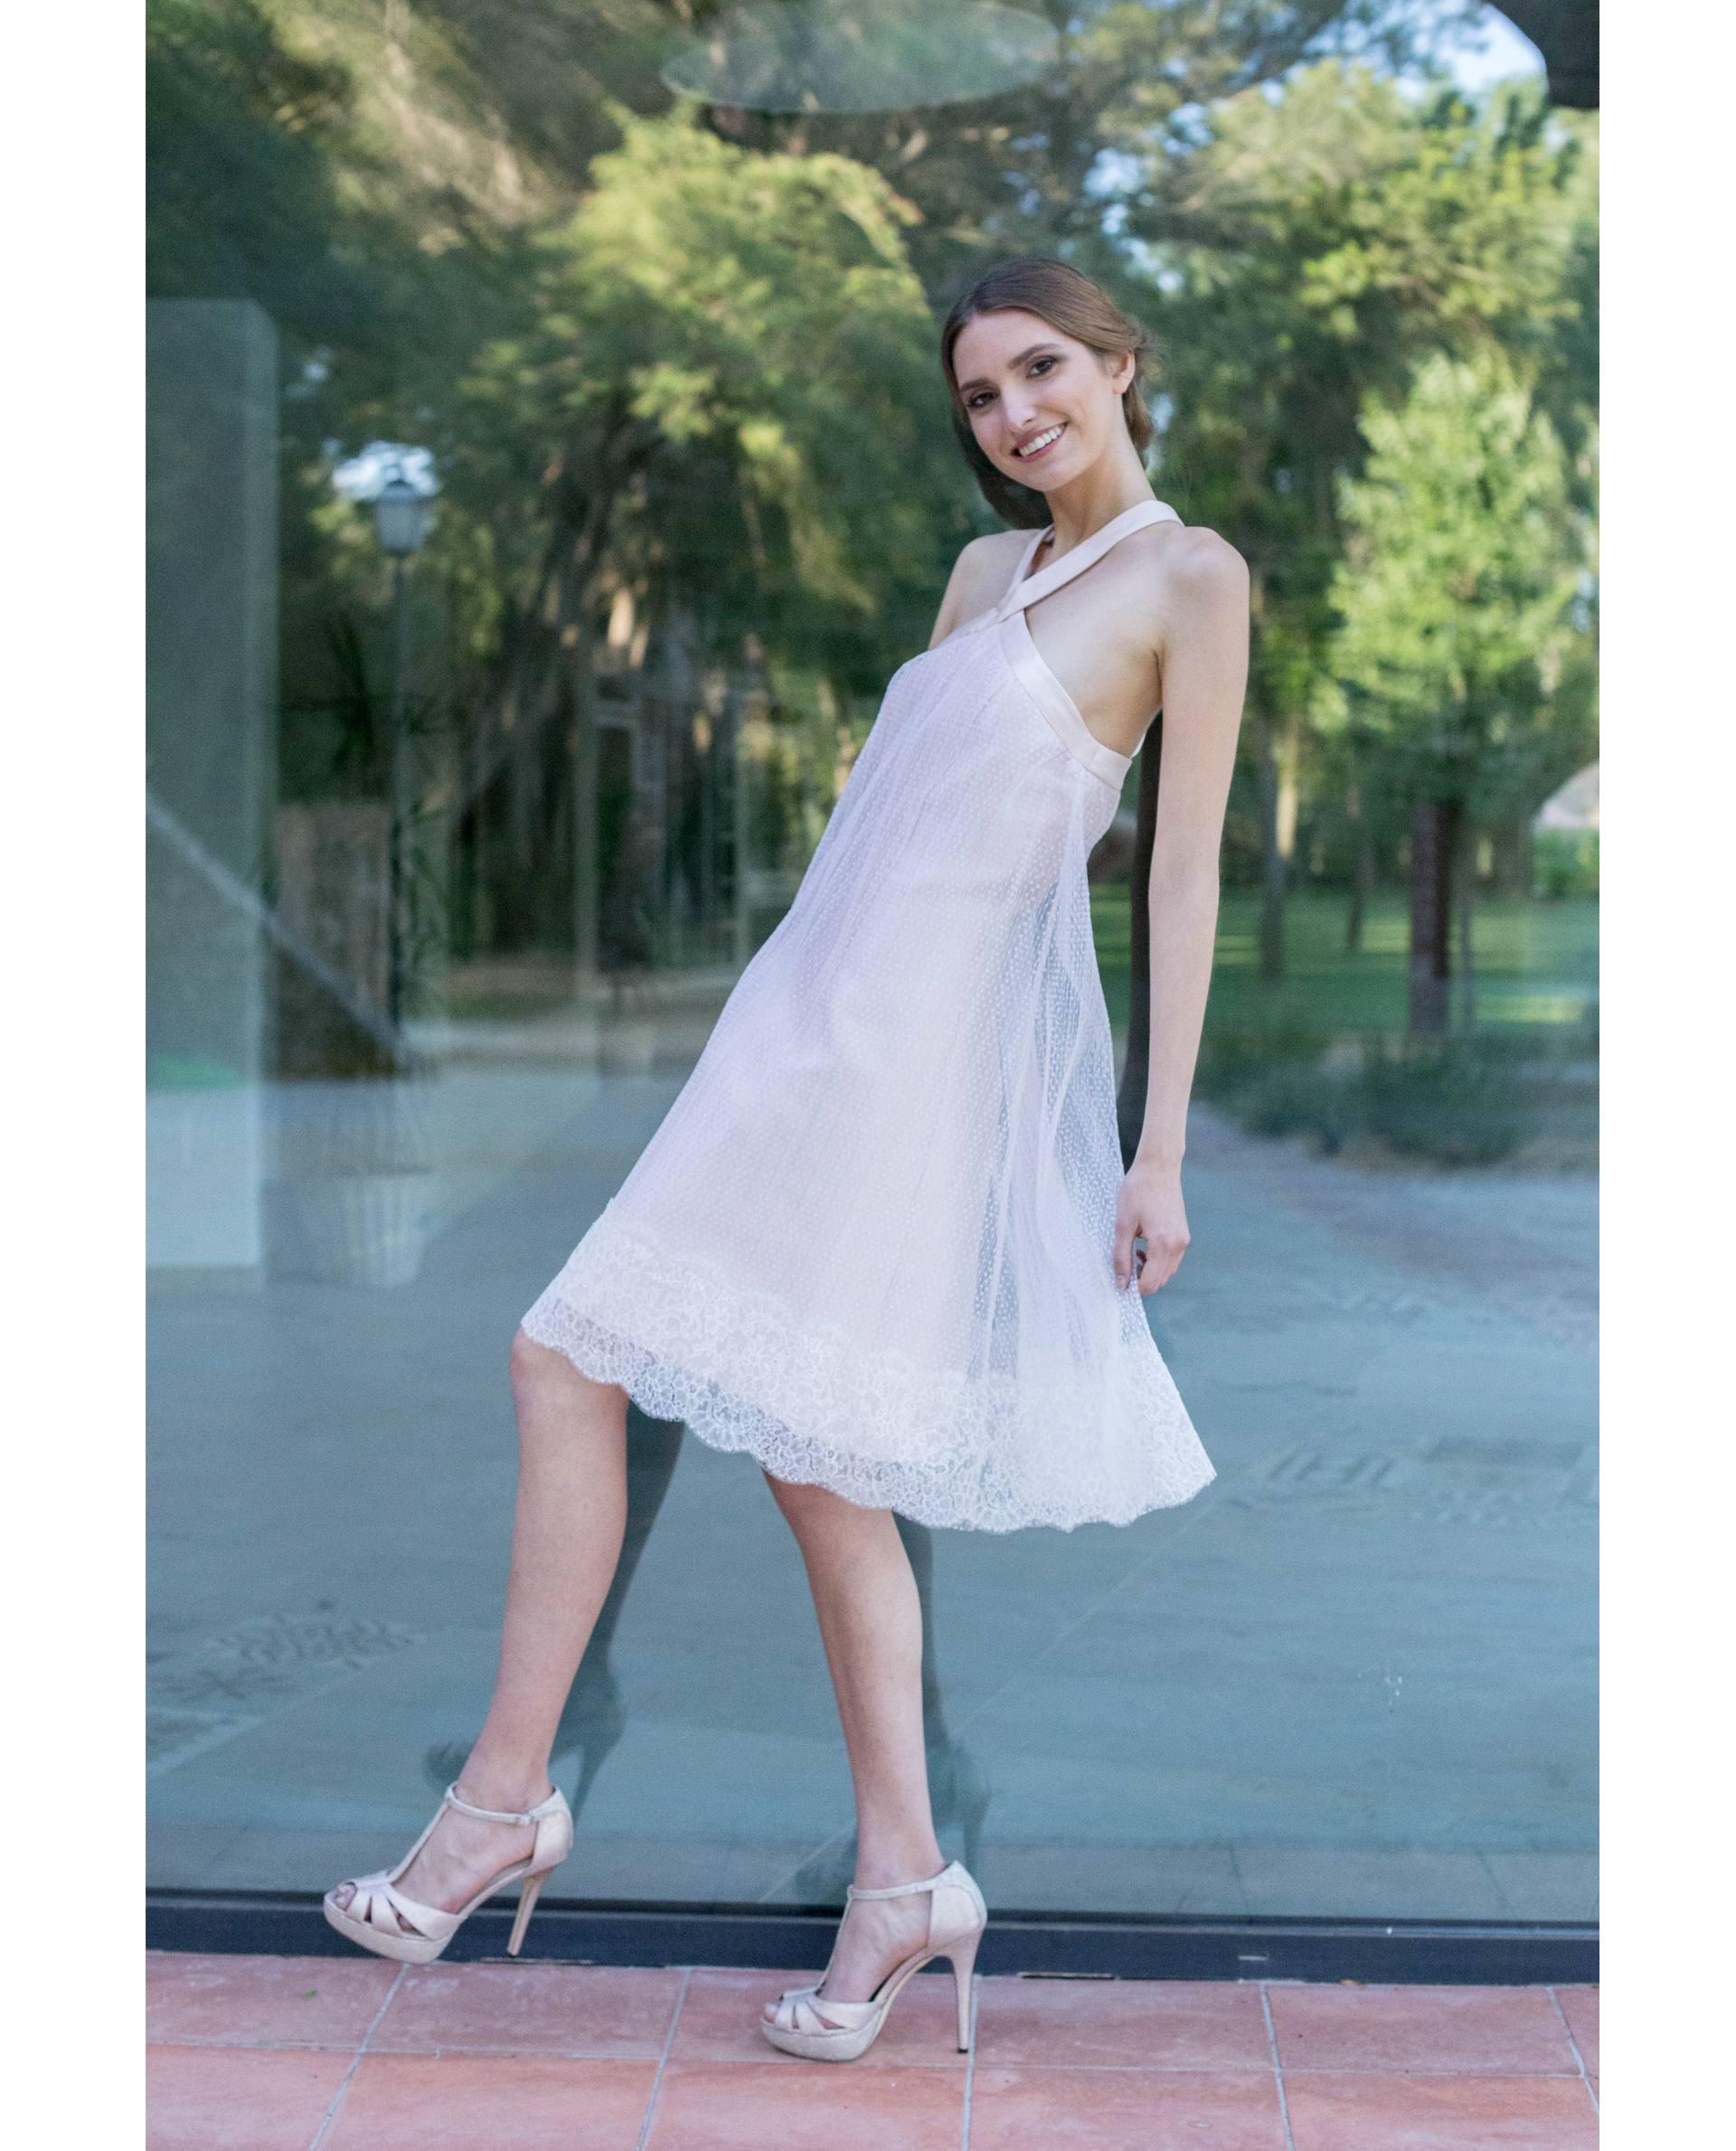 ATELIER-NATURE 2018/19 - VESTIDOS - vestido fiesta VALENTINA blanco